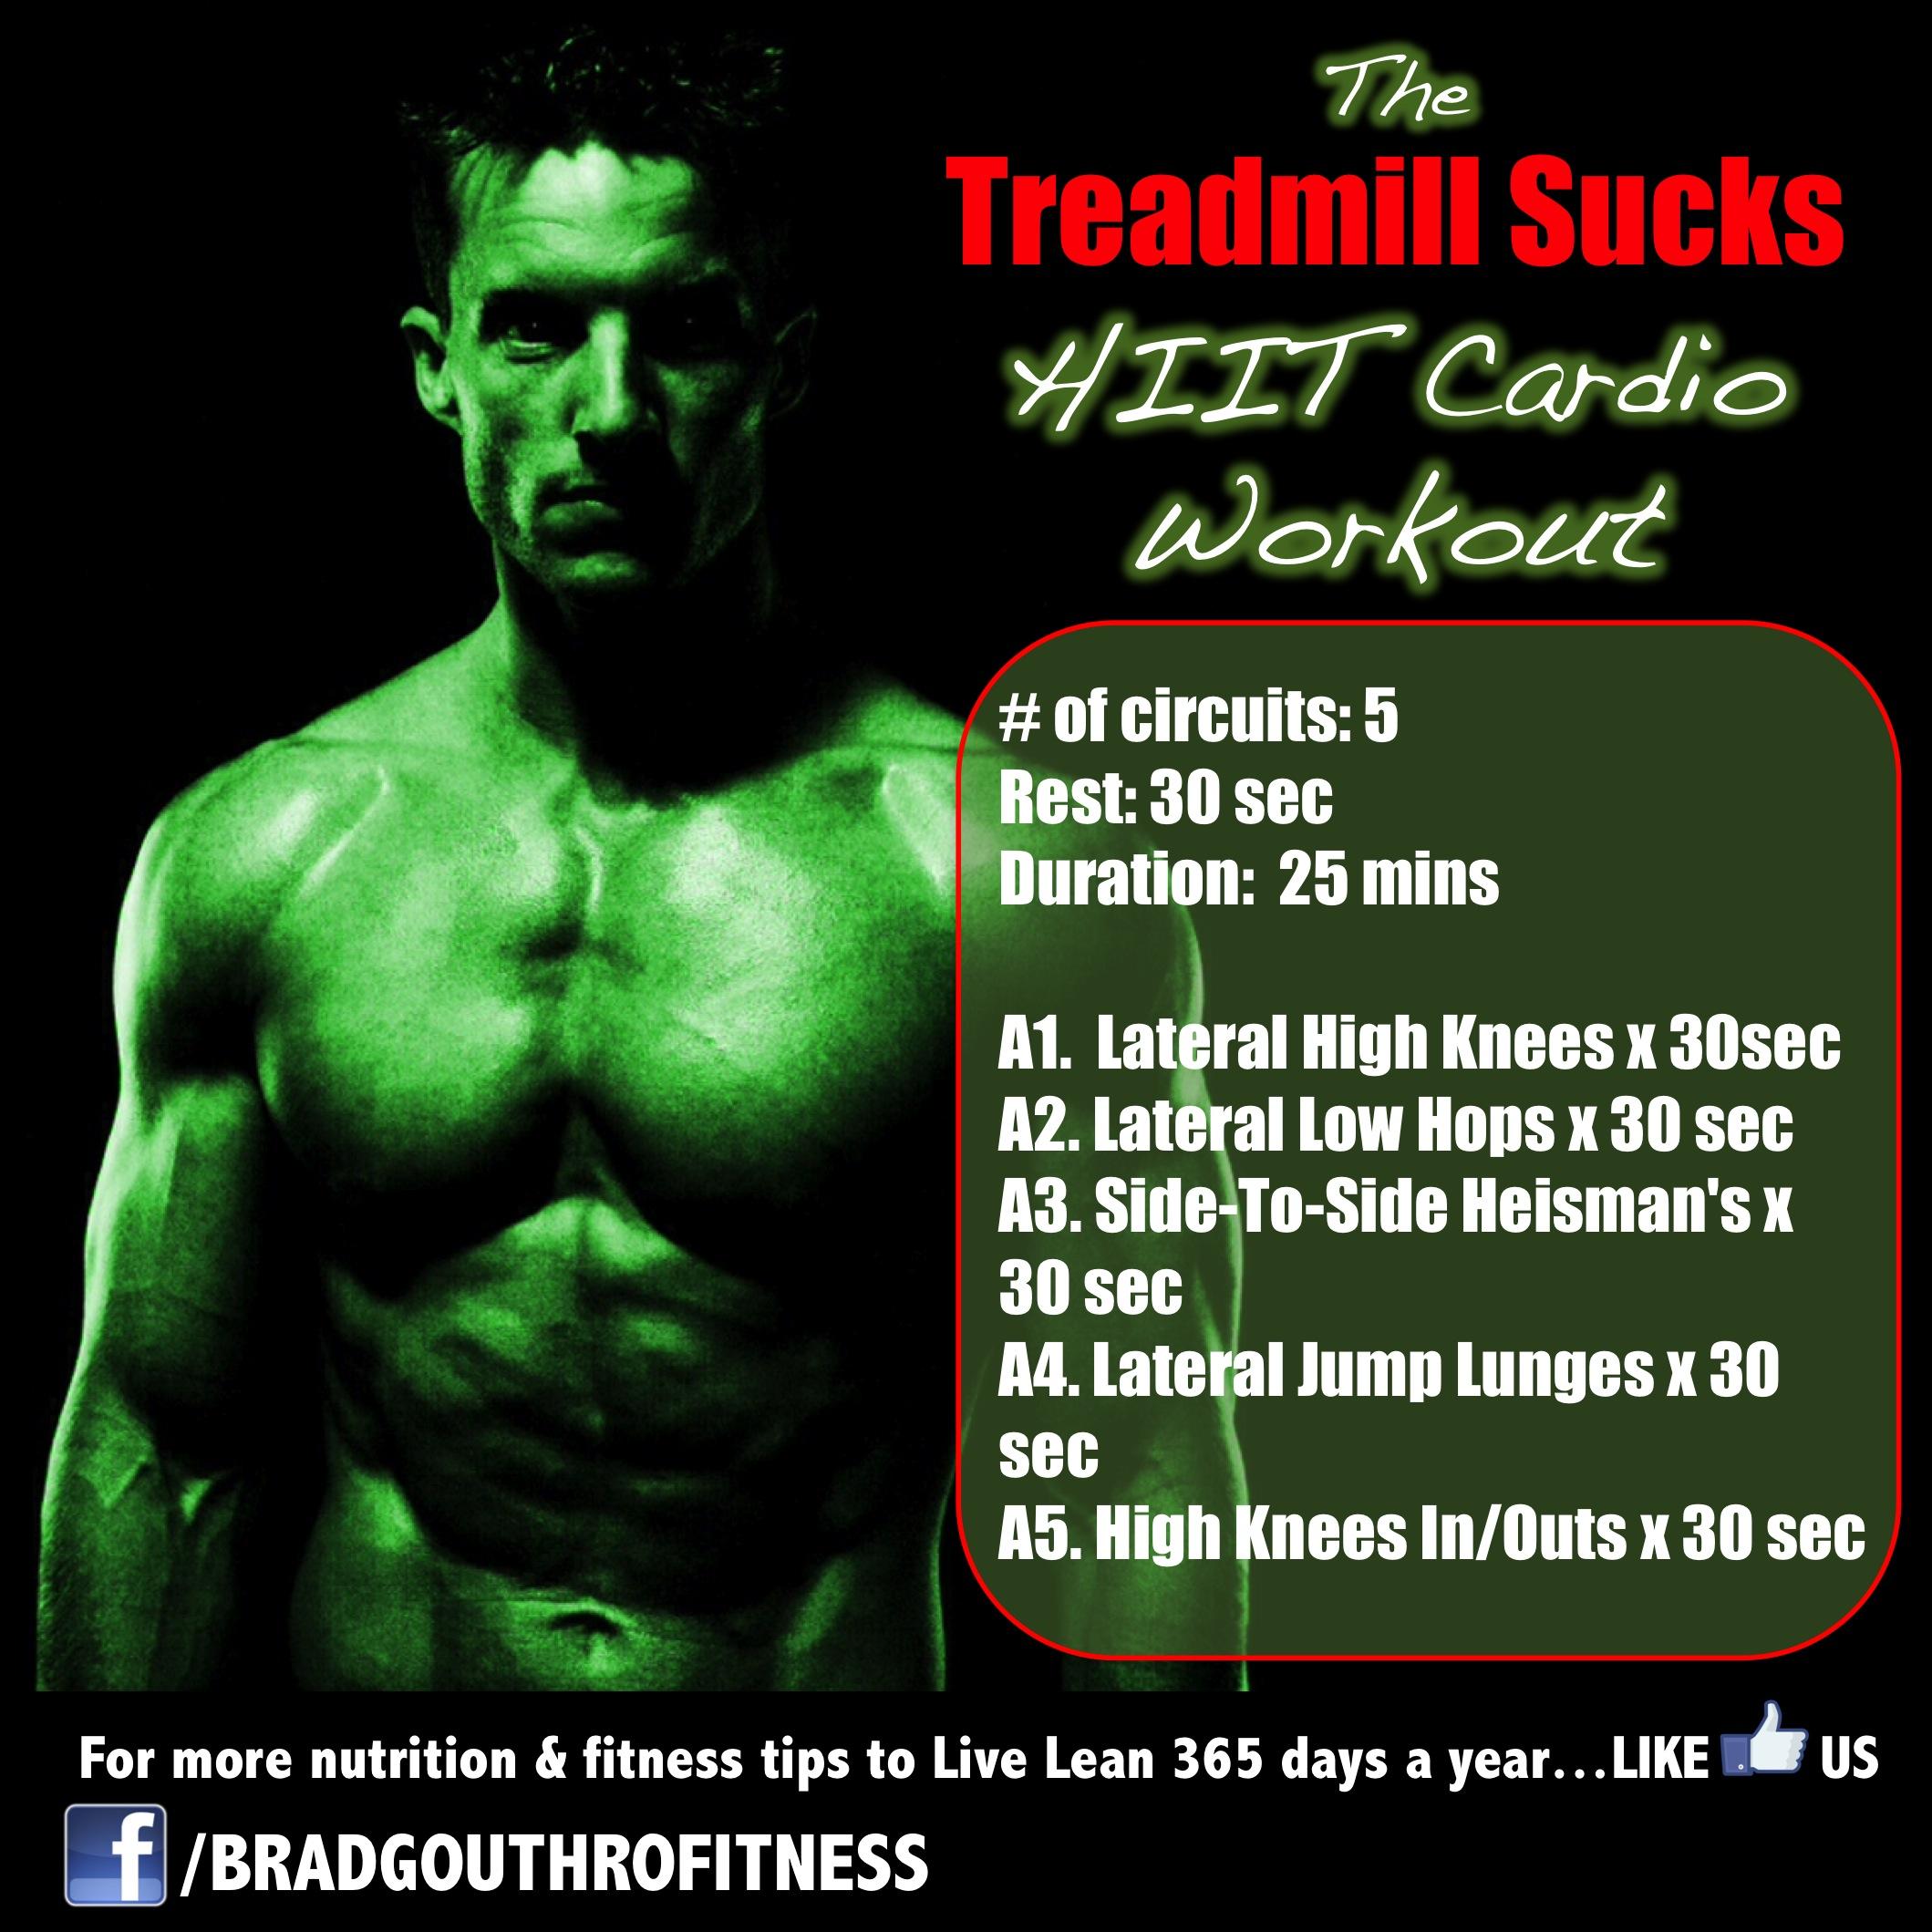 The Treadmill Sucks HIIT CARDIO workout routine